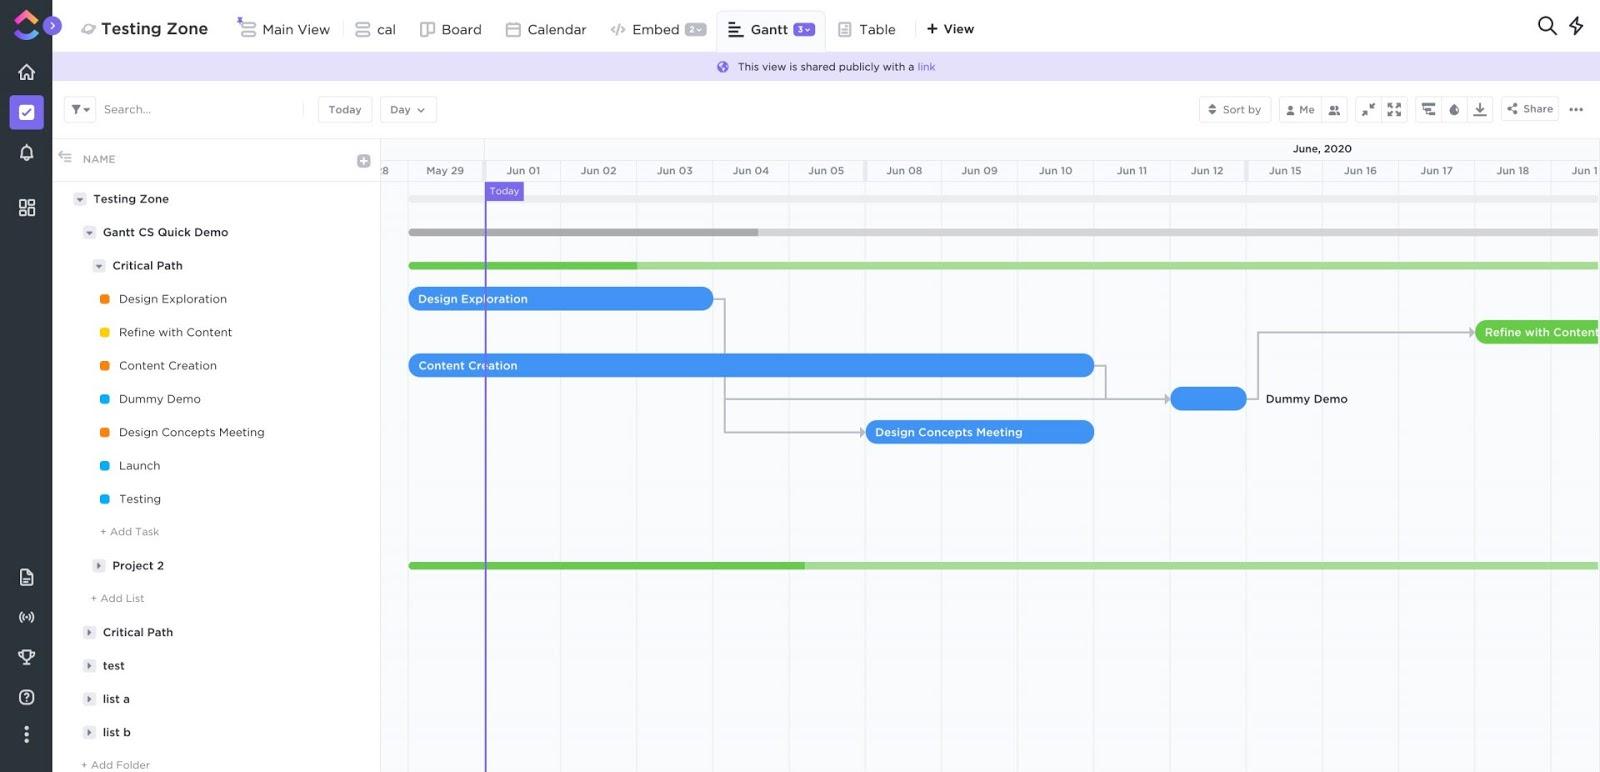 Gantt Charts - Project Scheduling